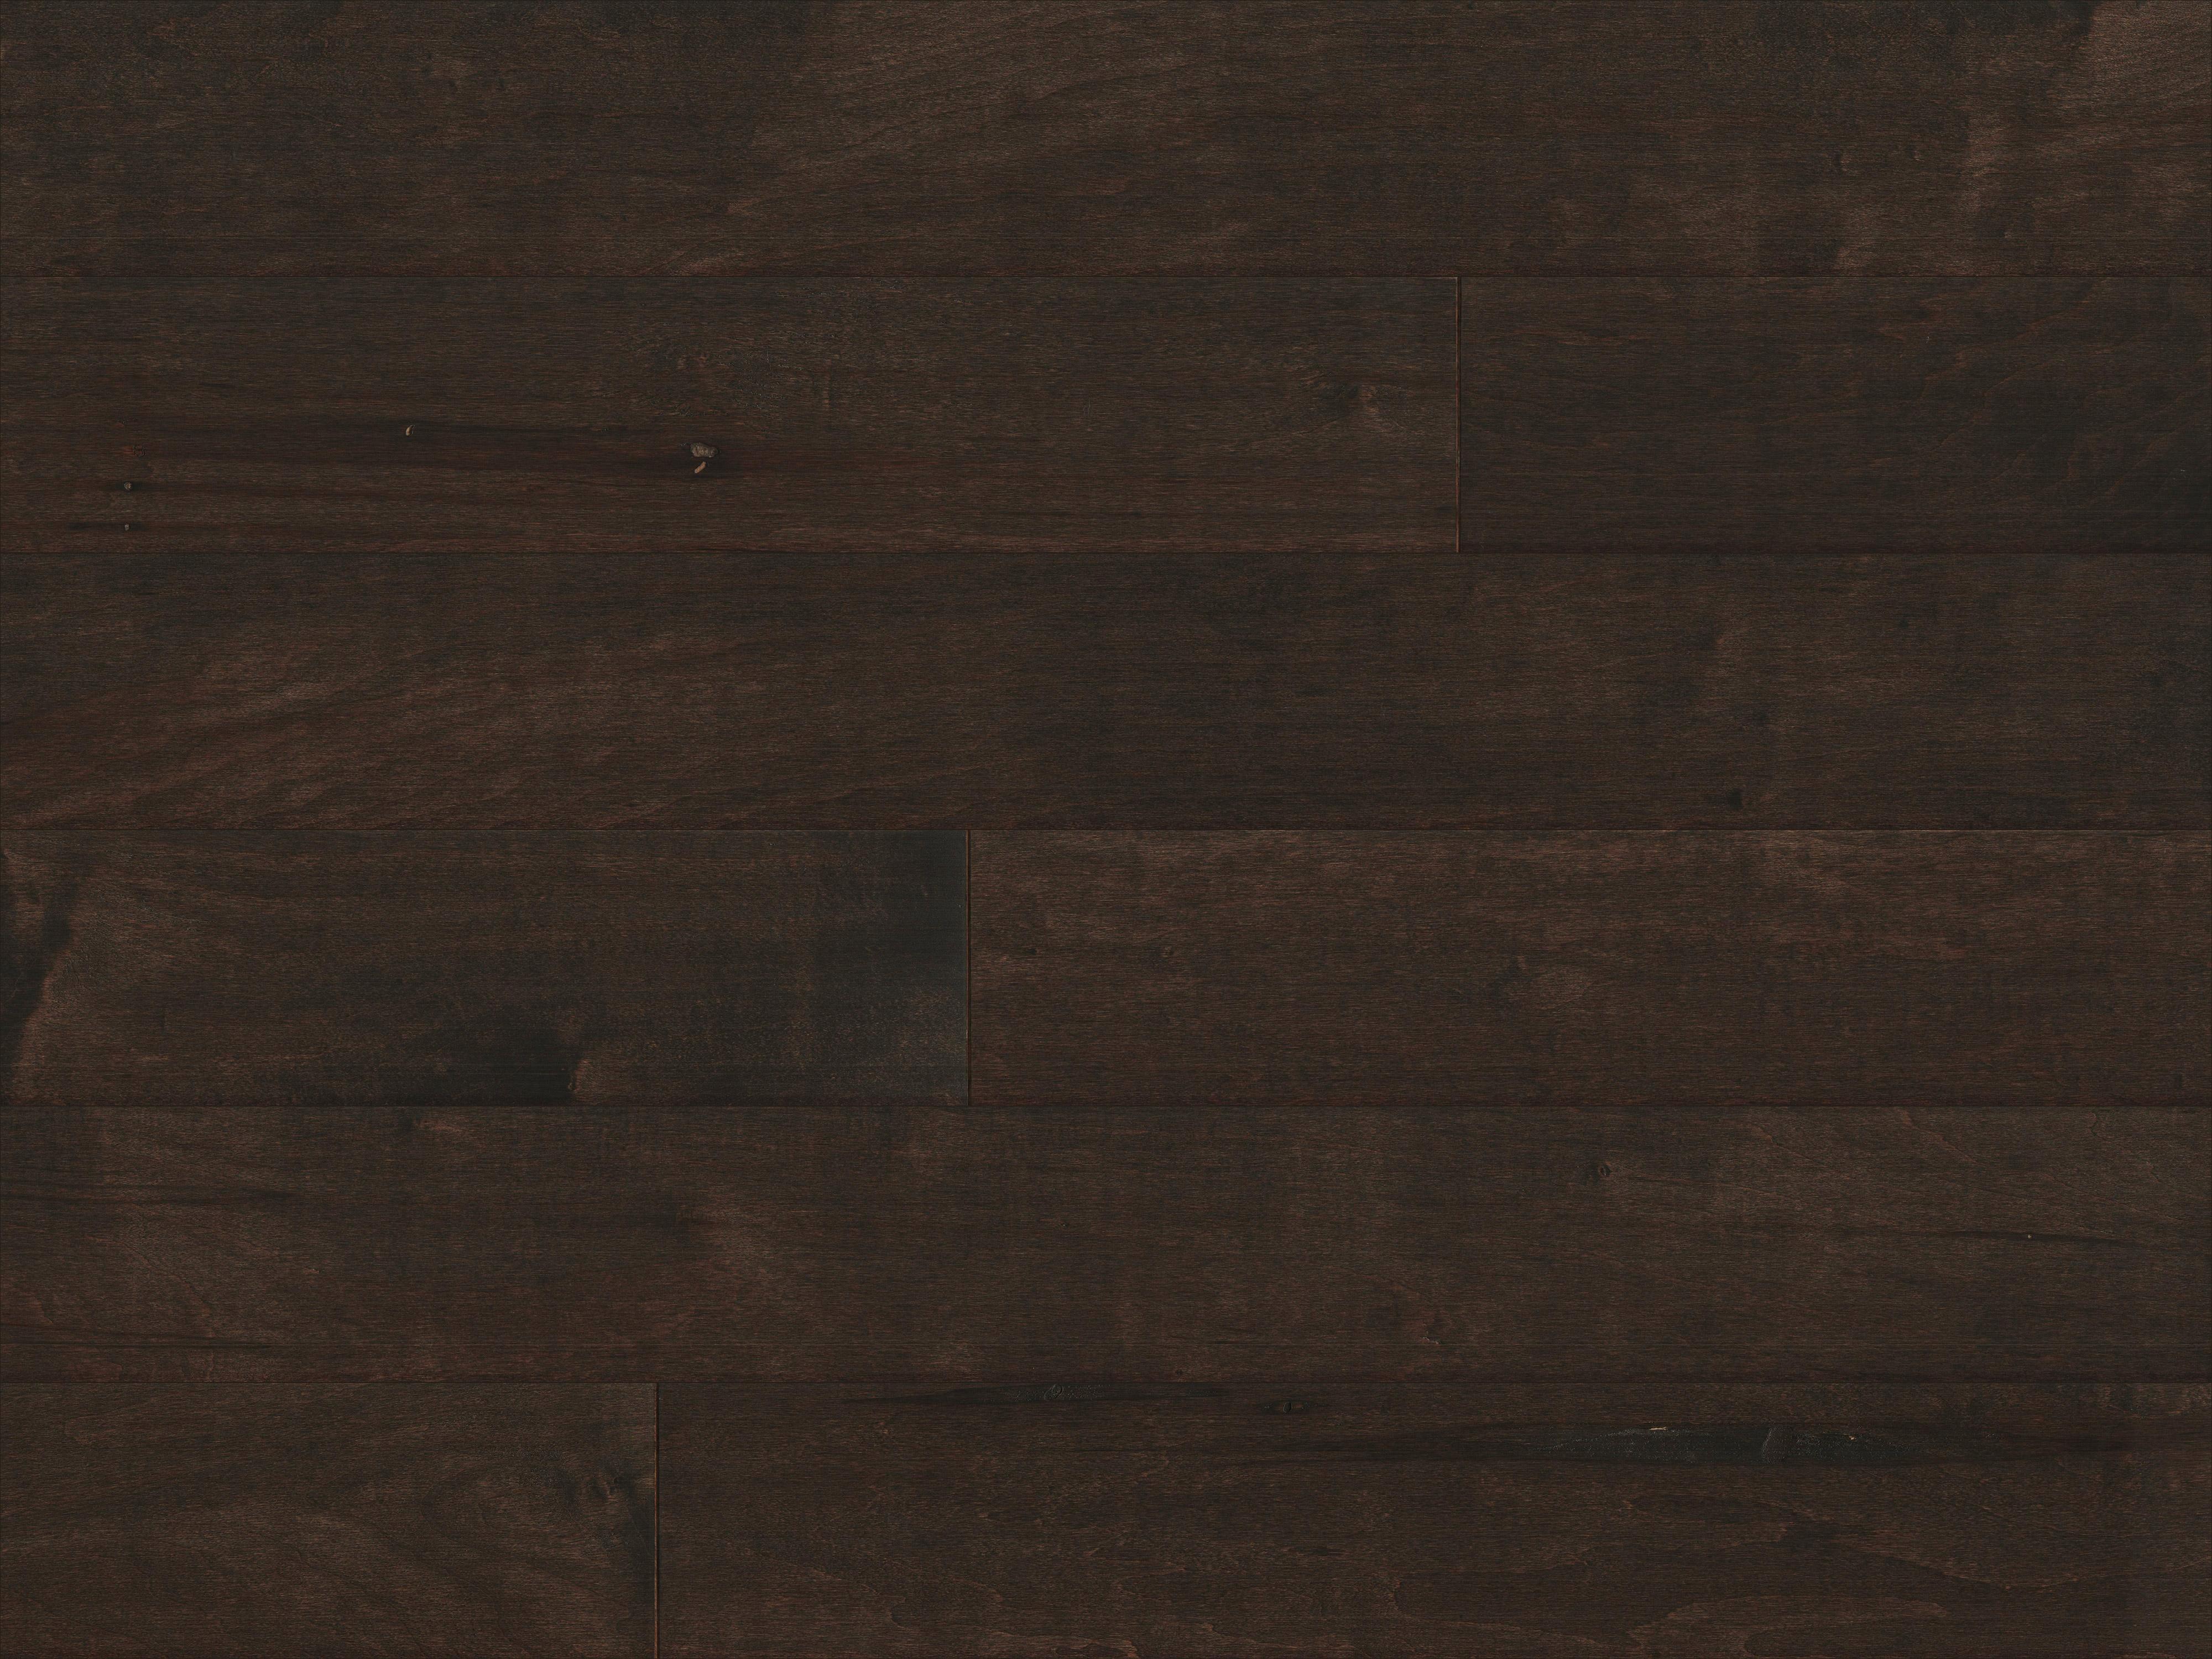 3 8 engineered hardwood flooring of 51 luxury wide plank distressed engineered hardwood flooring mobel regarding wide plank distressed engineered hardwood flooring fresh mullican ridgecrest maple cappuccino 1 2 thick 5